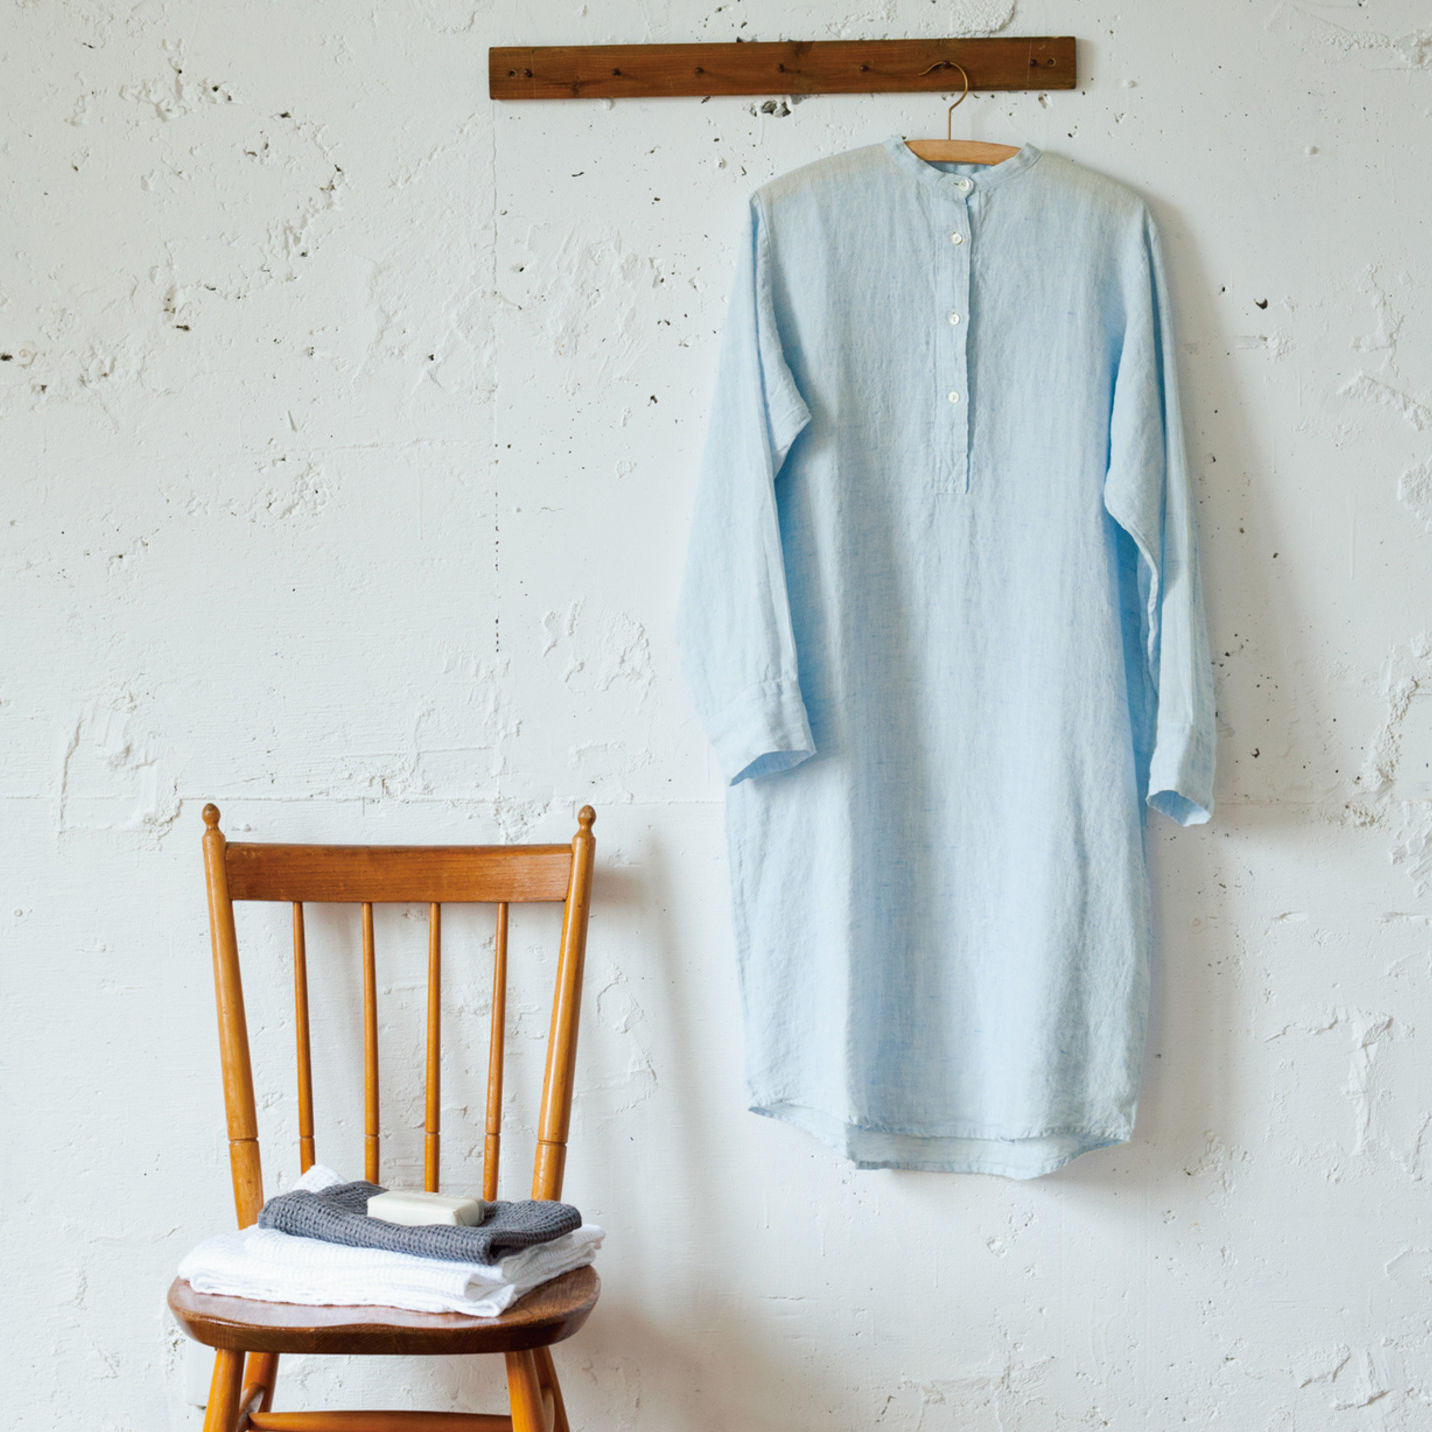 Linomeda (リノメダ) リネンロングナイトシャツ